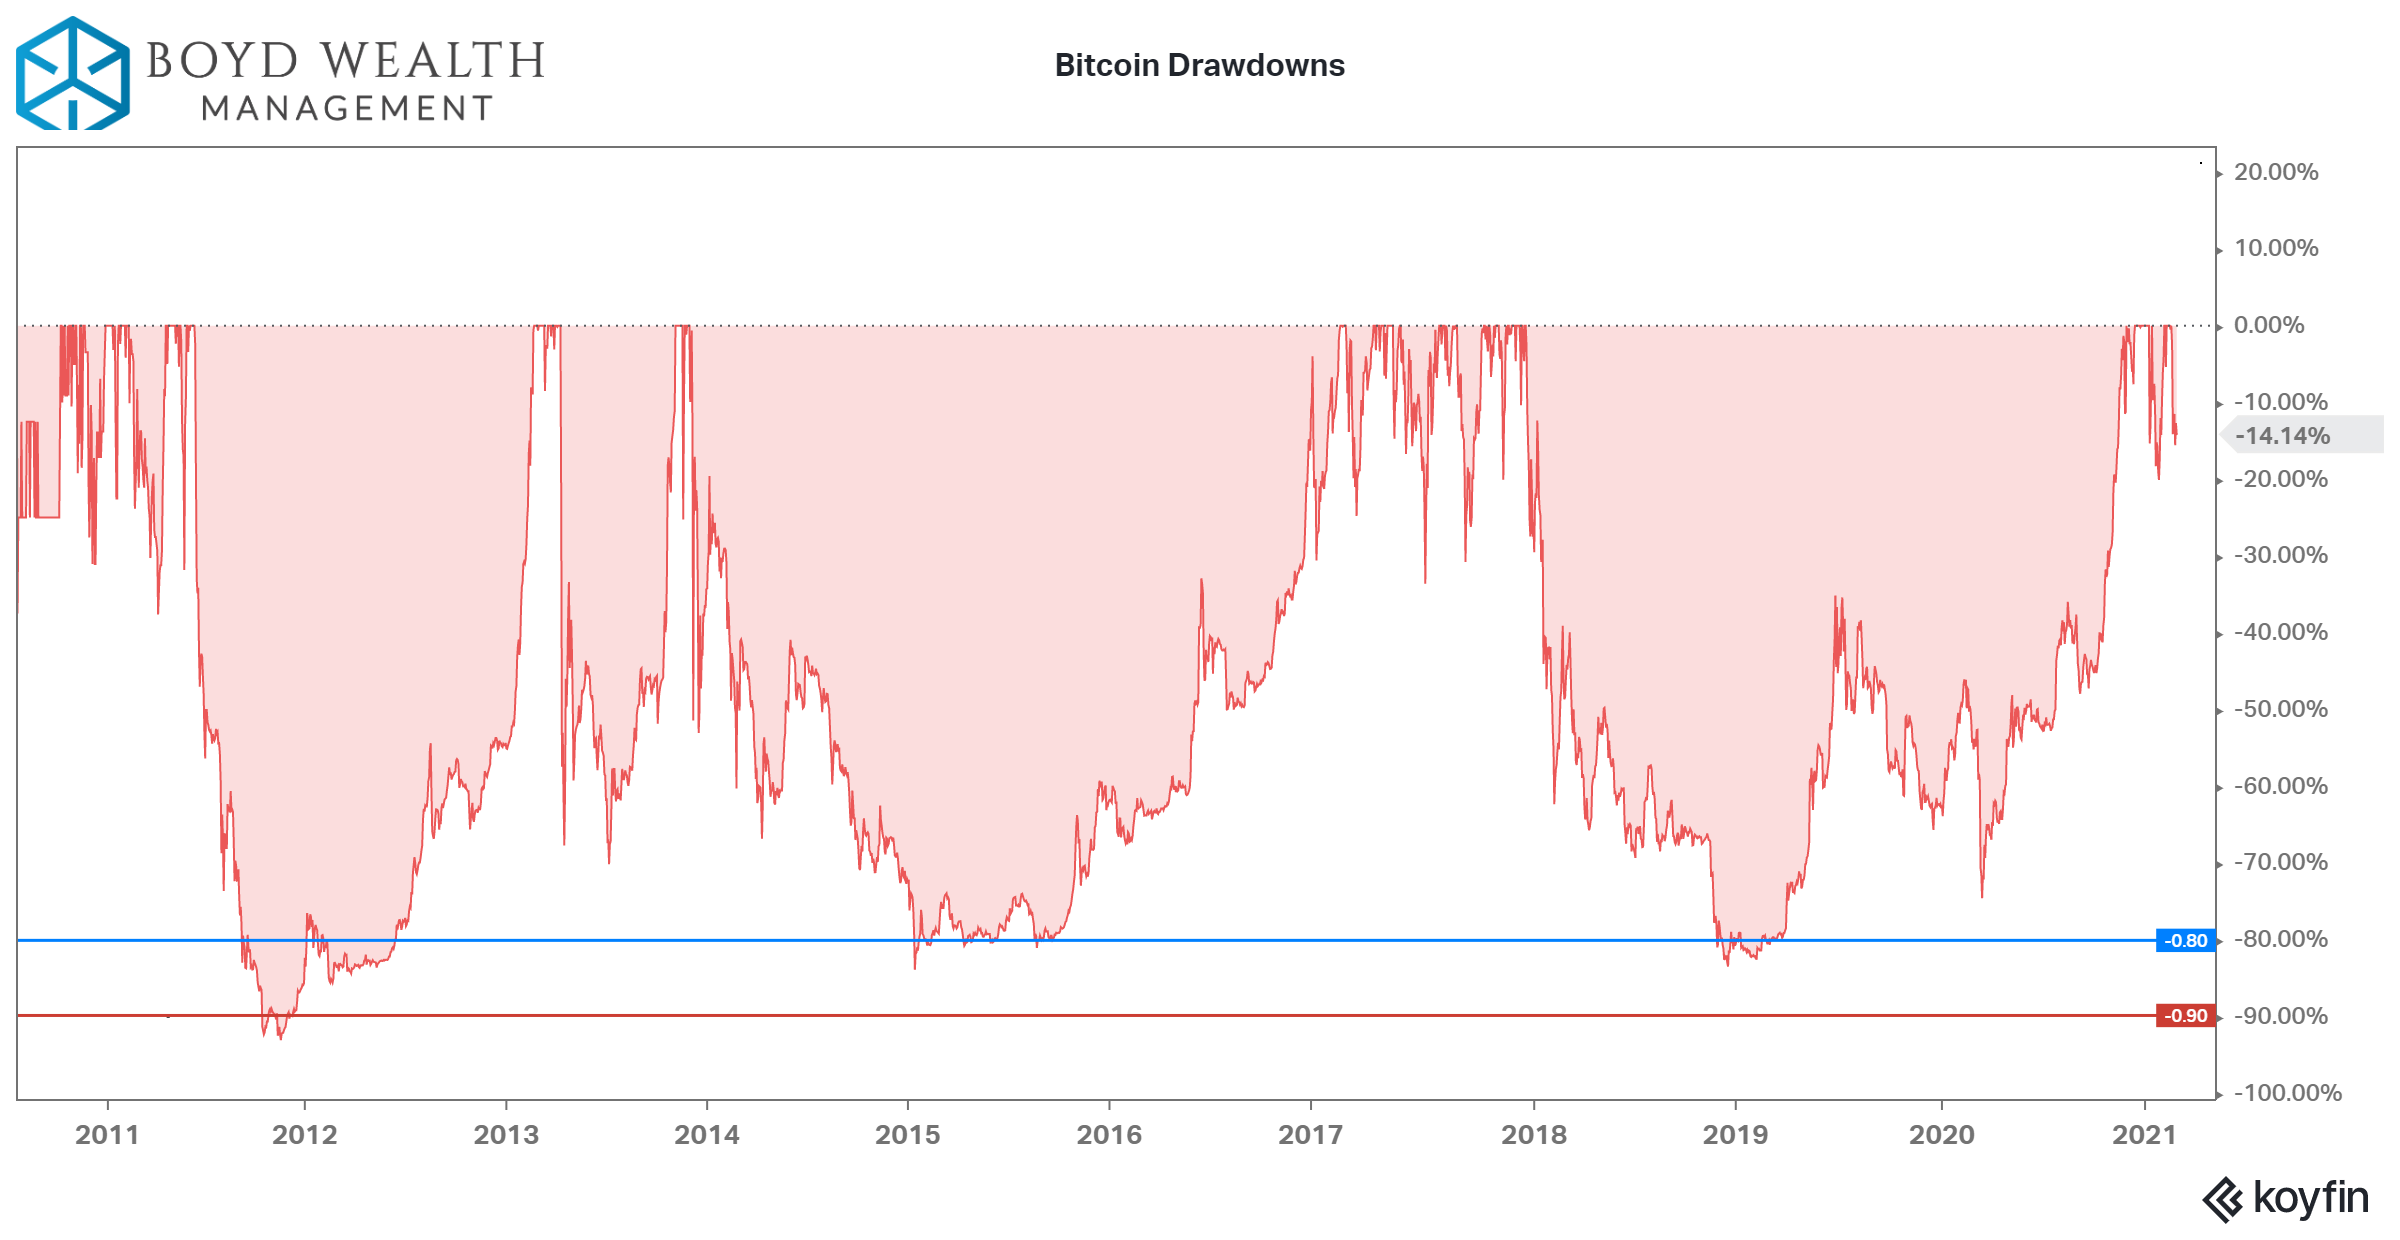 Bitcoin Drawdowns